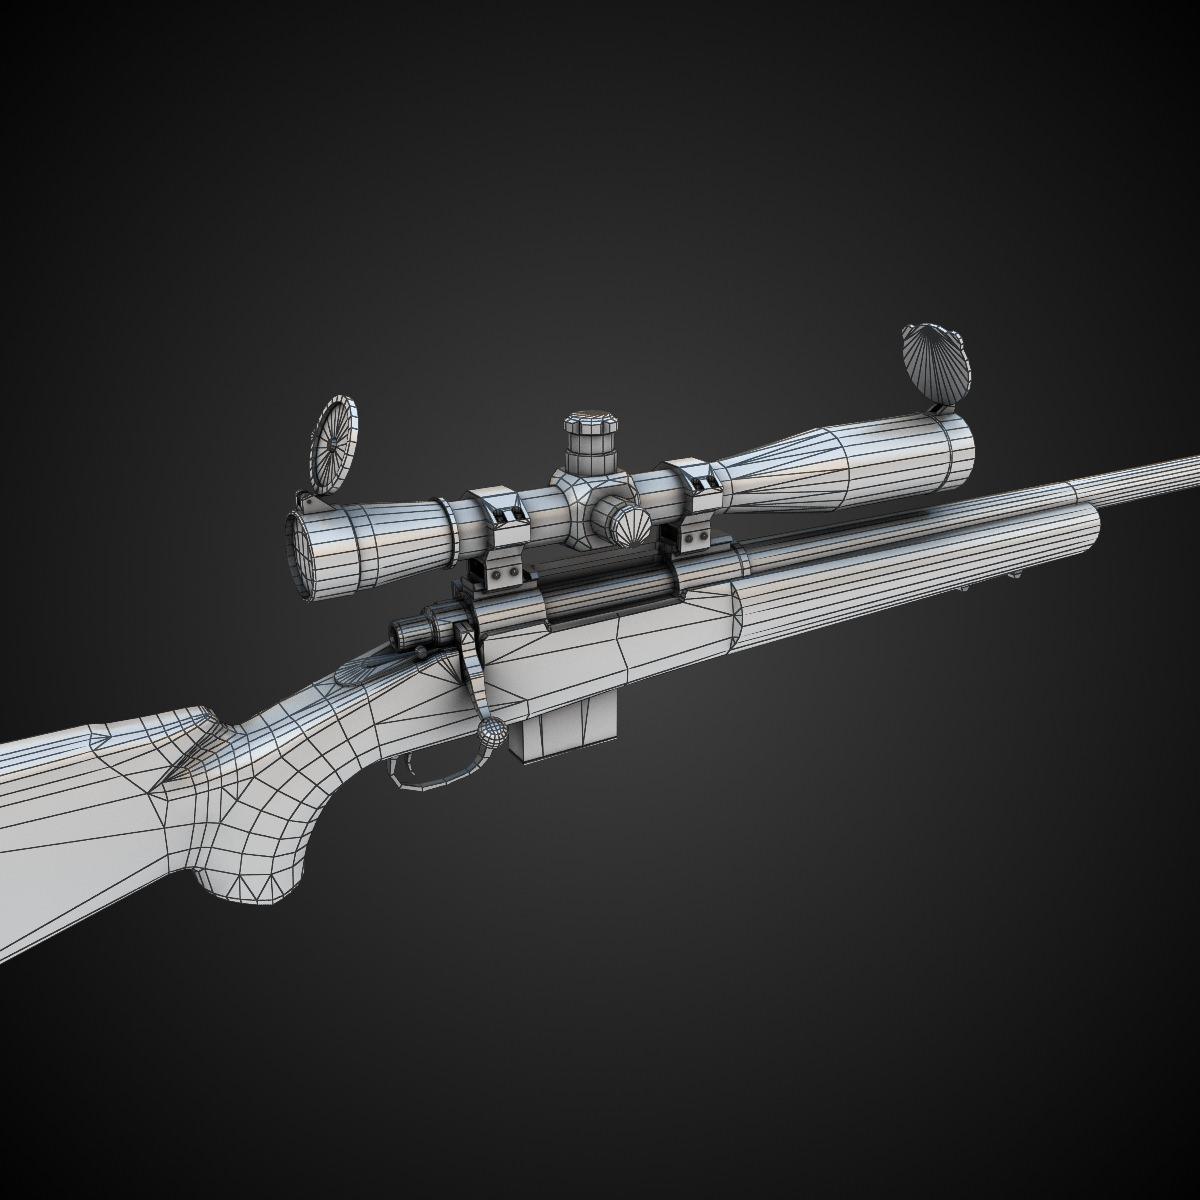 m24a2 sniper rifle - photo #28